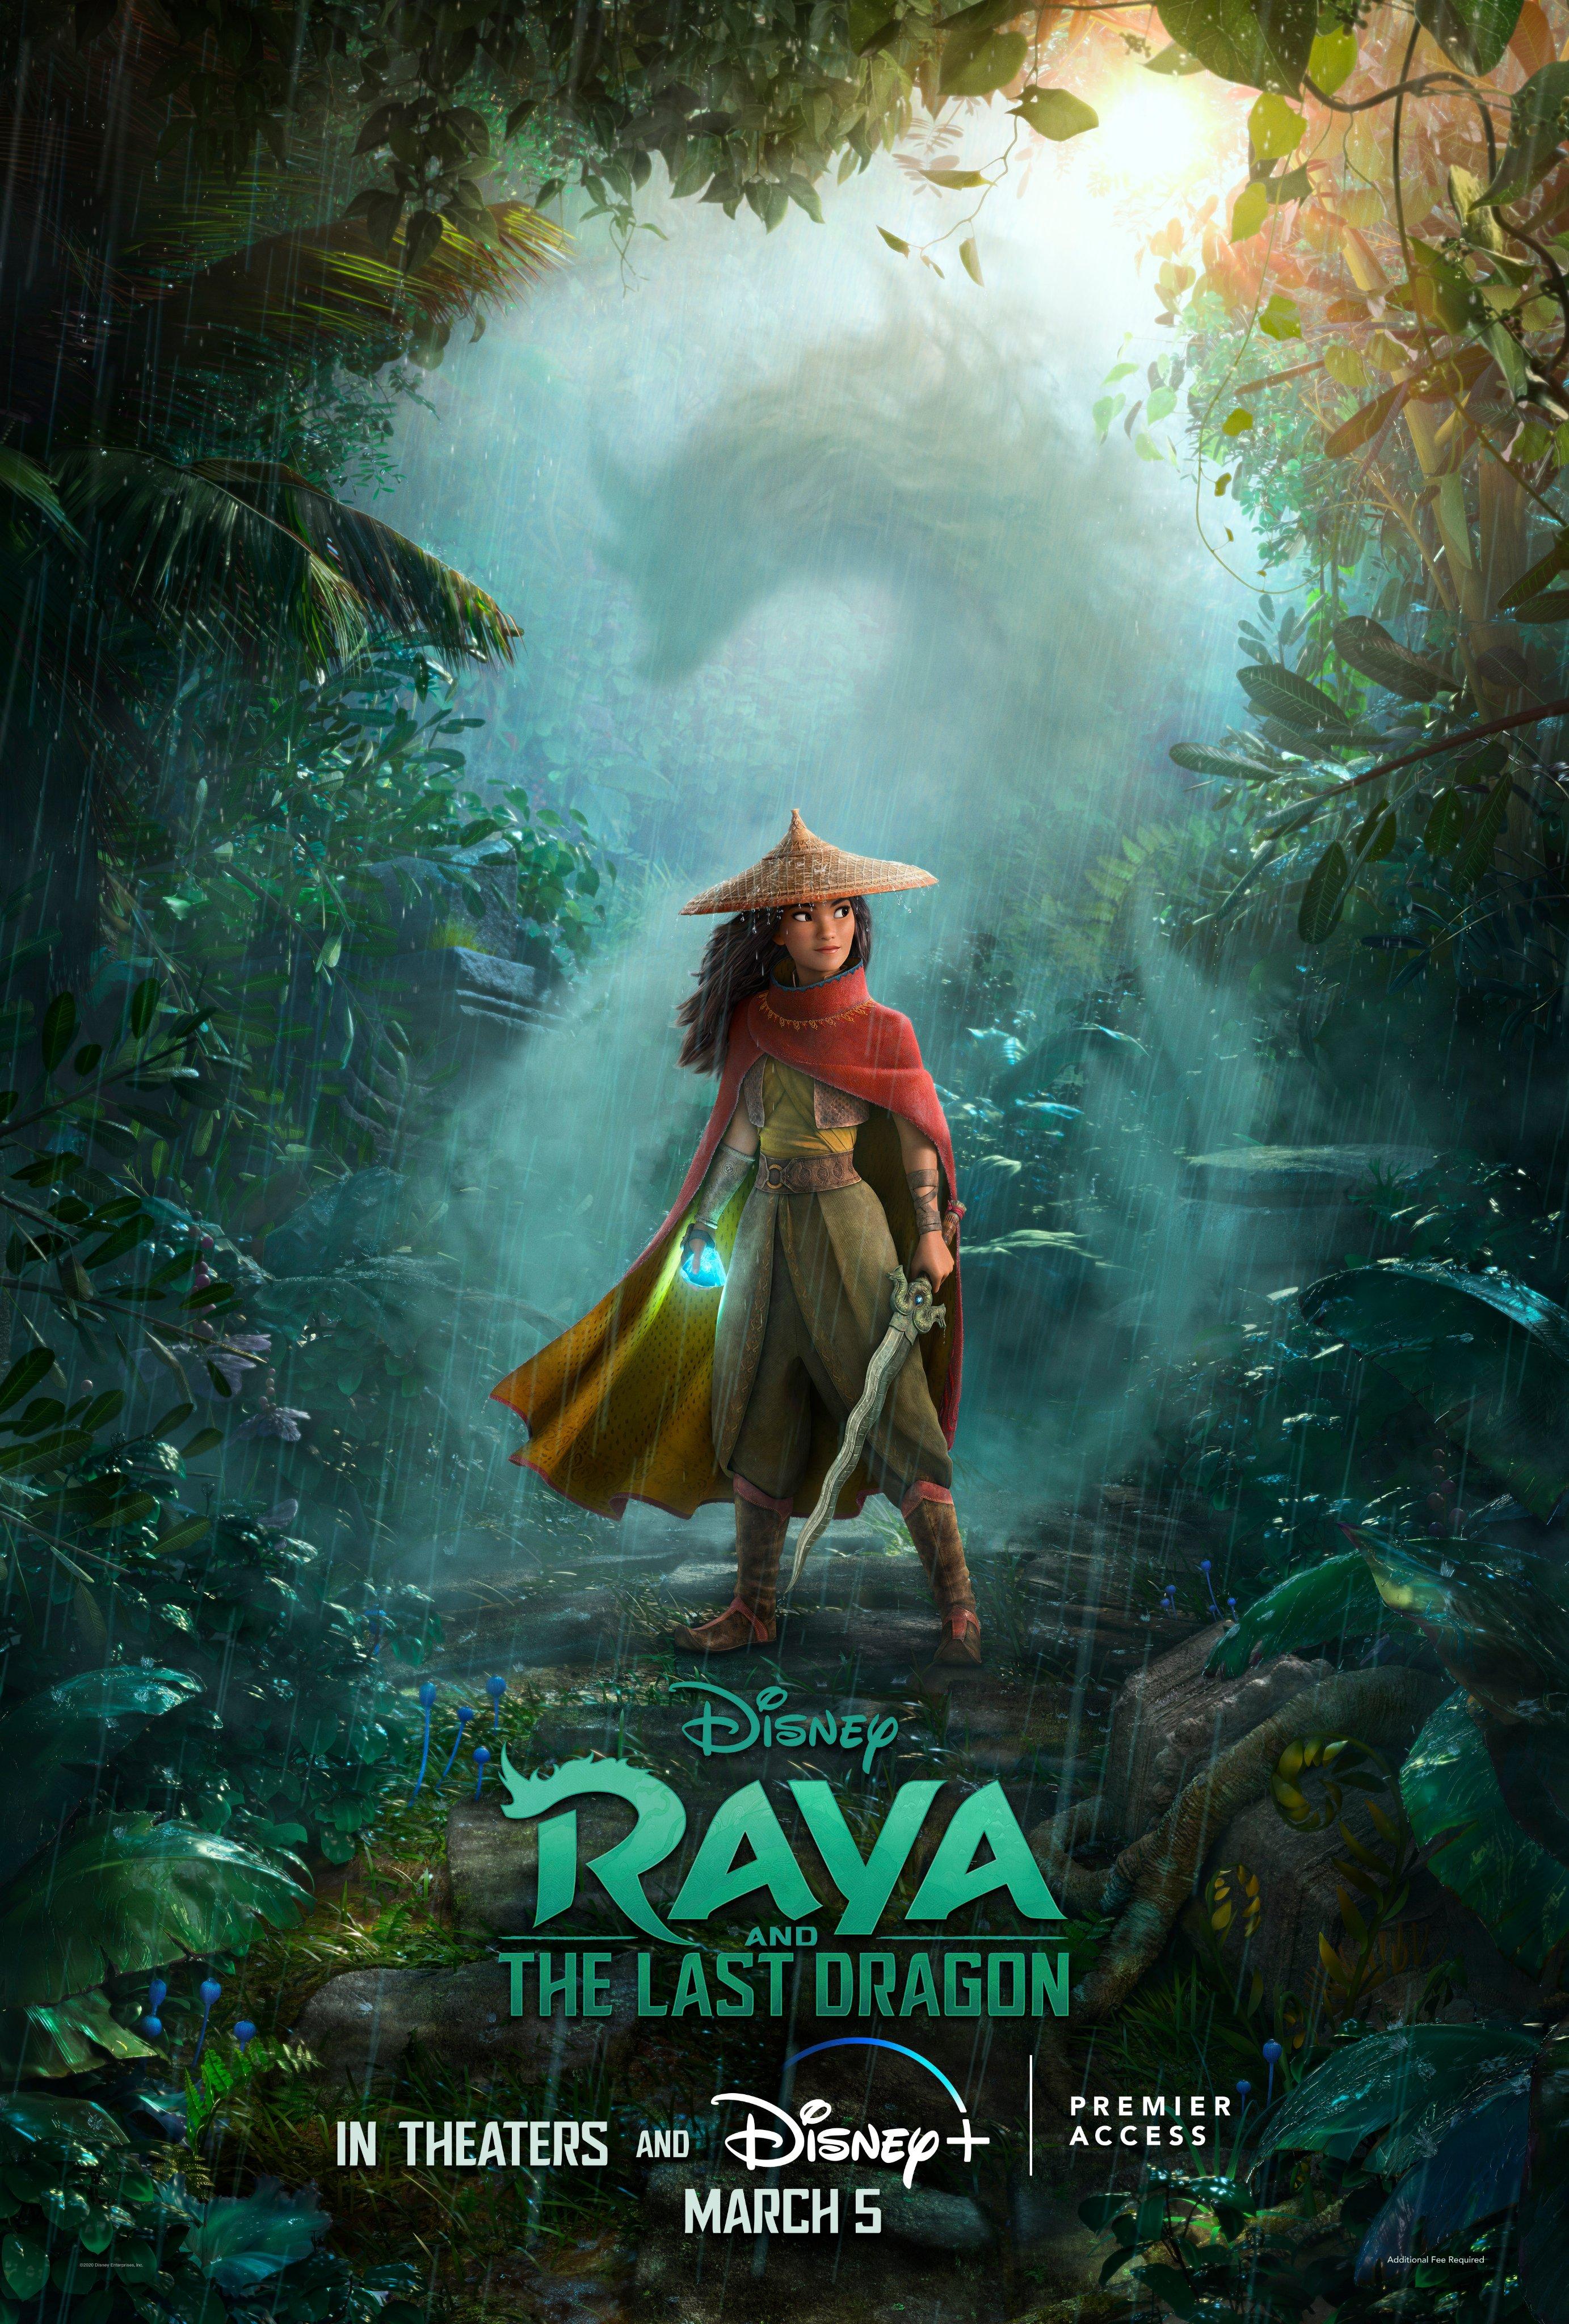 Raya_&_The_Last_Dragon_Premier_&_Theater_Poster